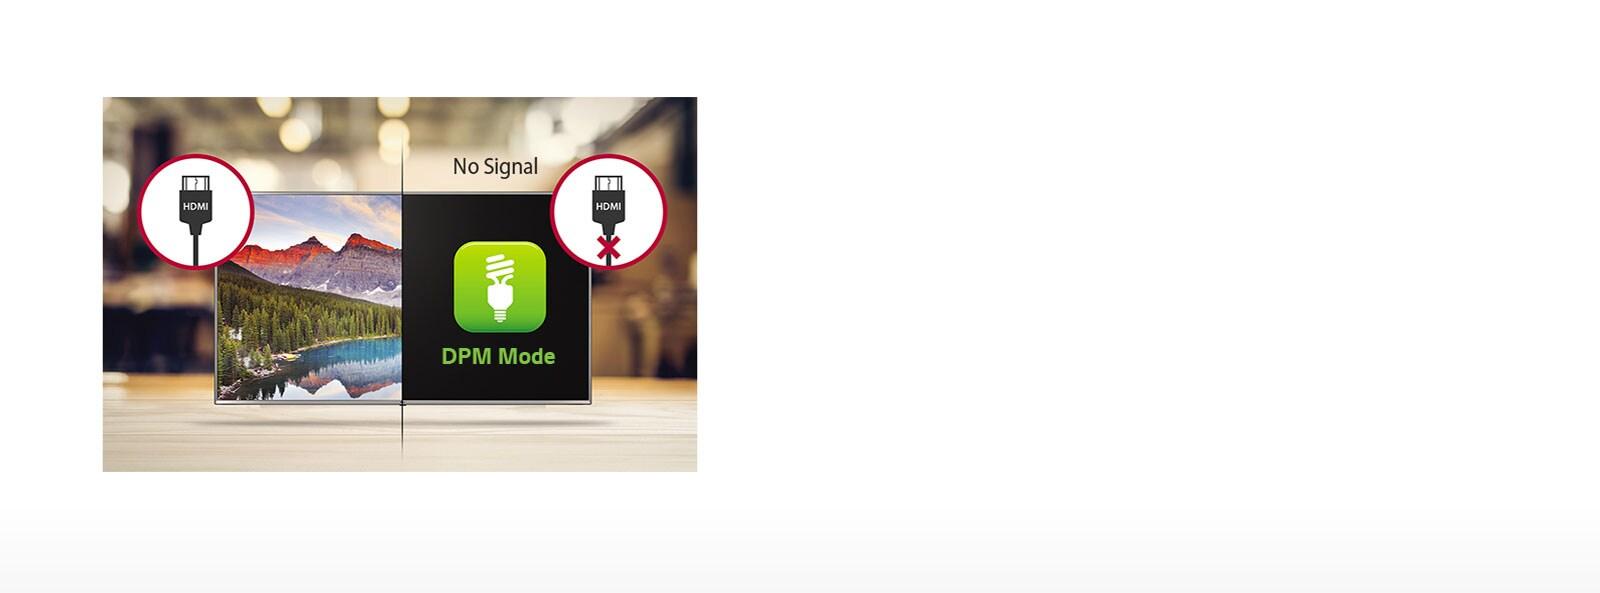 07_DPM-(Display-Power-Management)_1534145055756